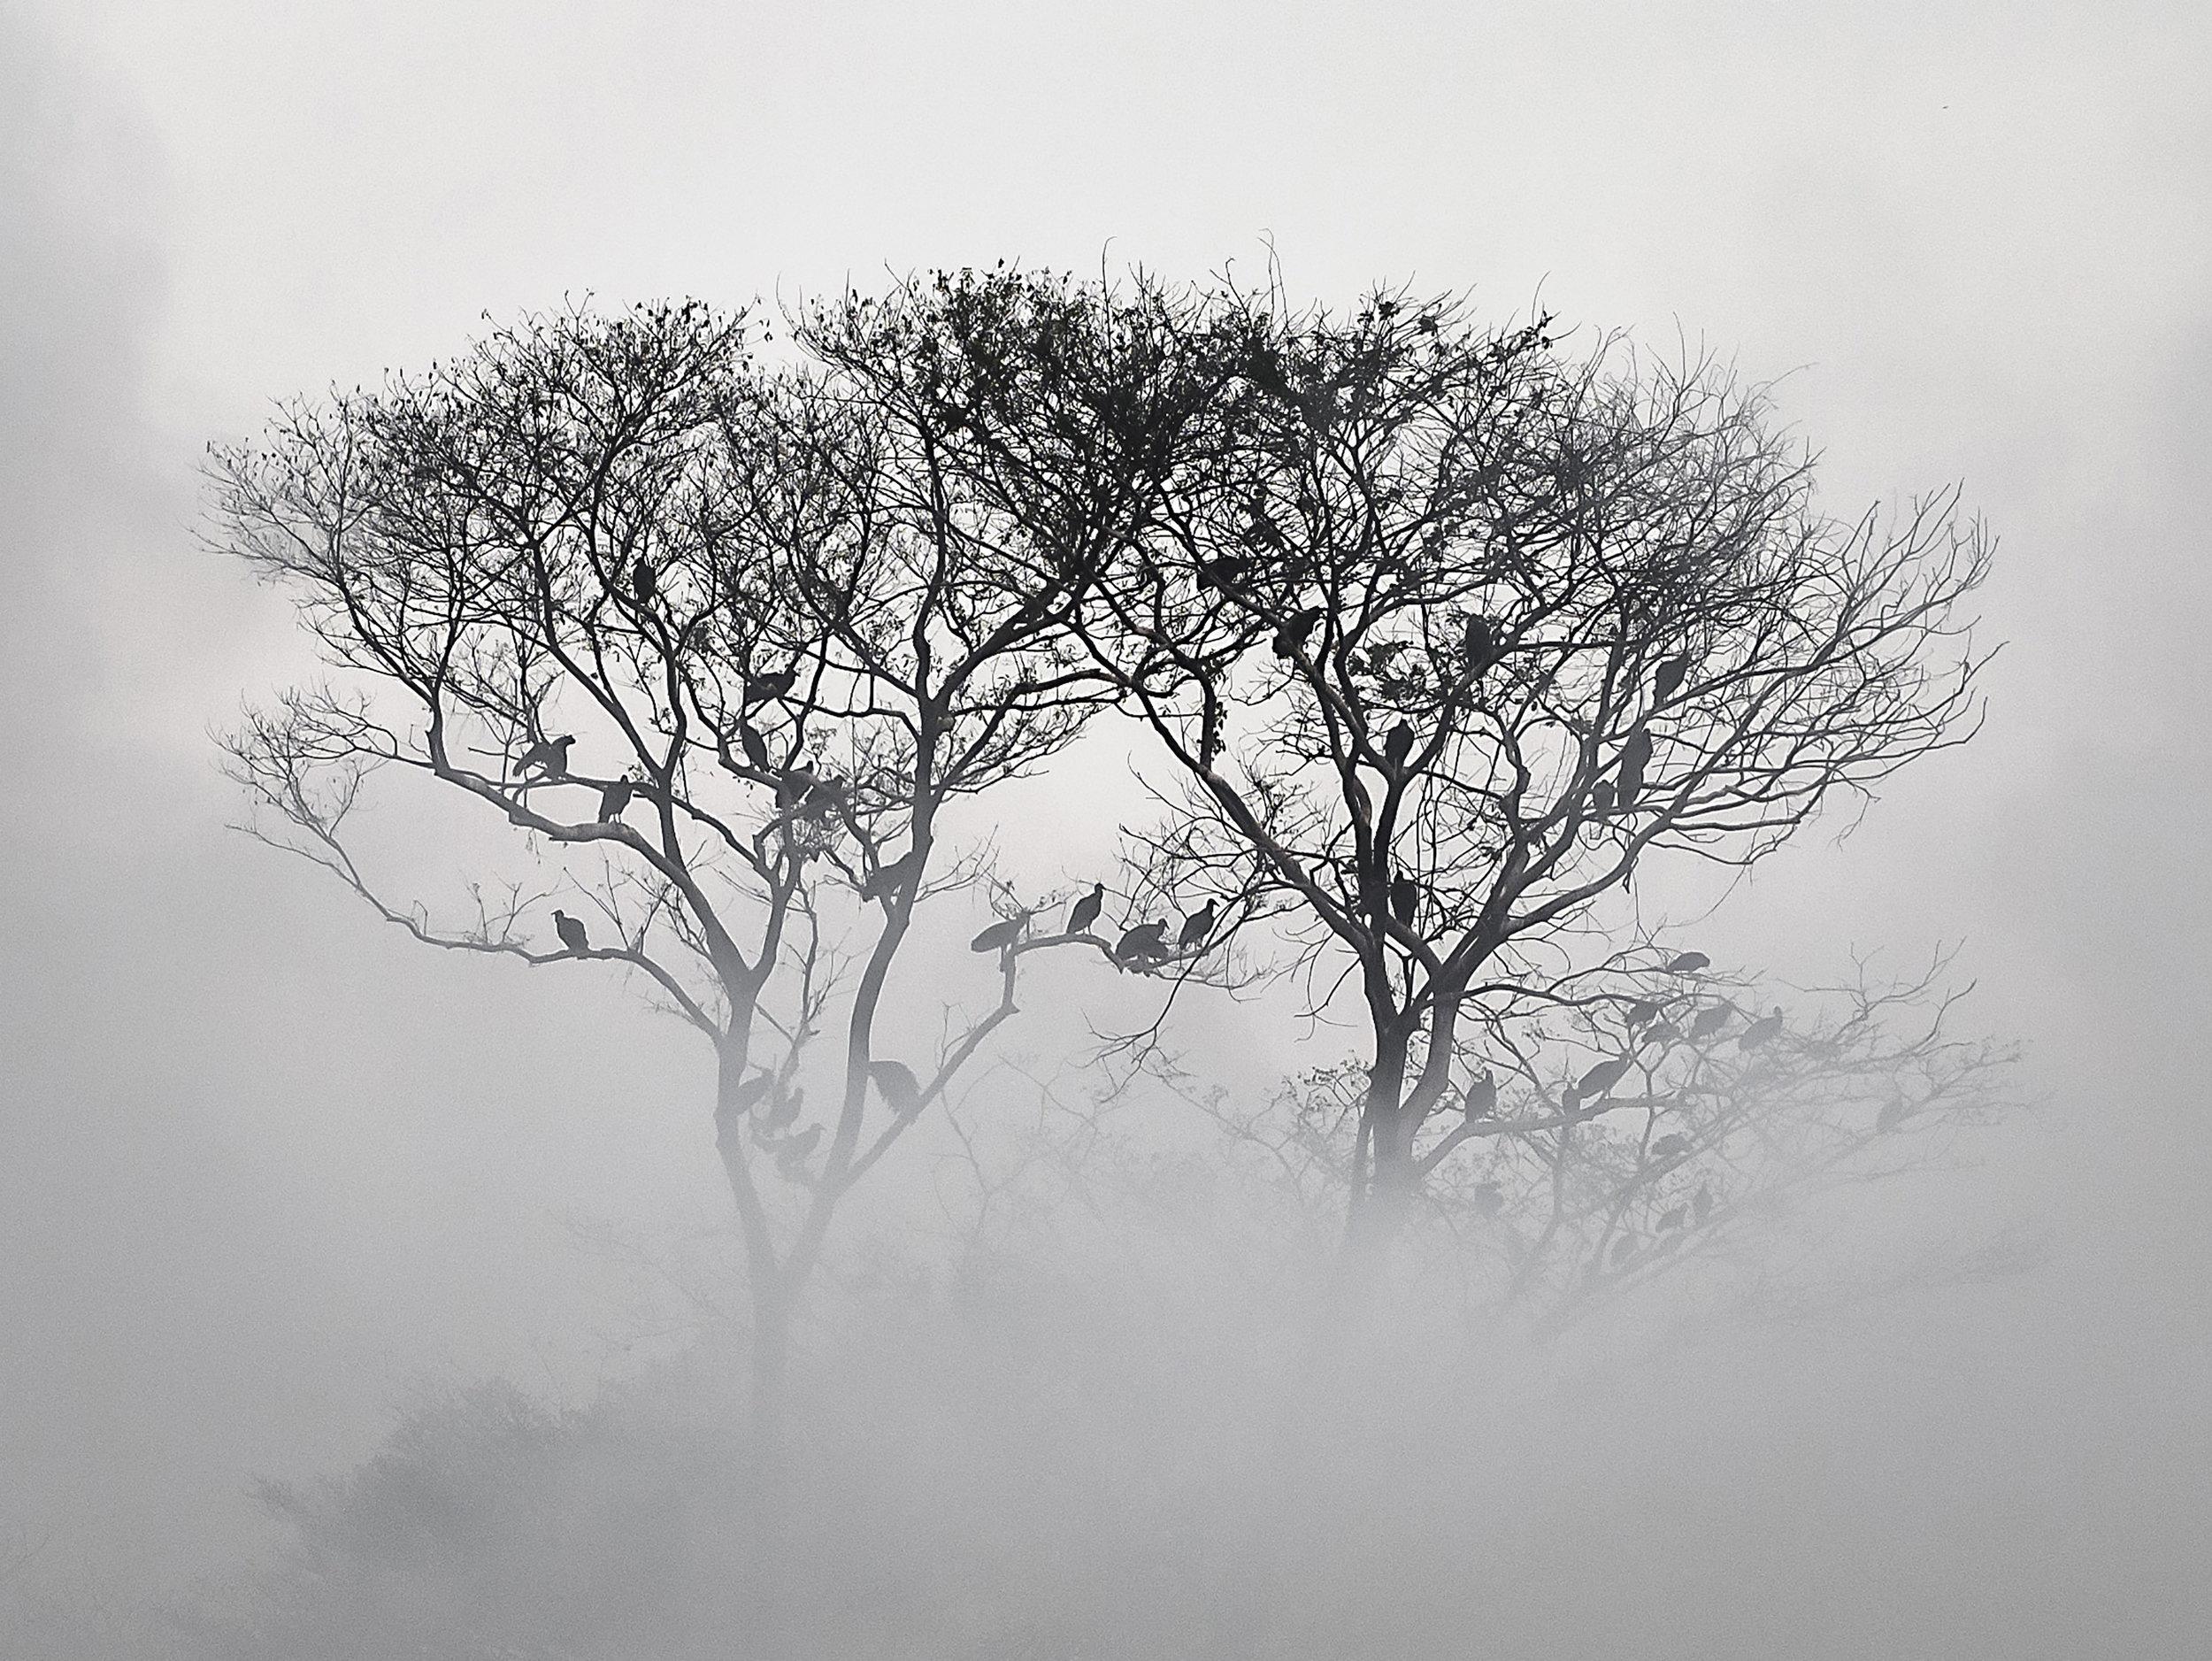 Escuintla, Guatemala